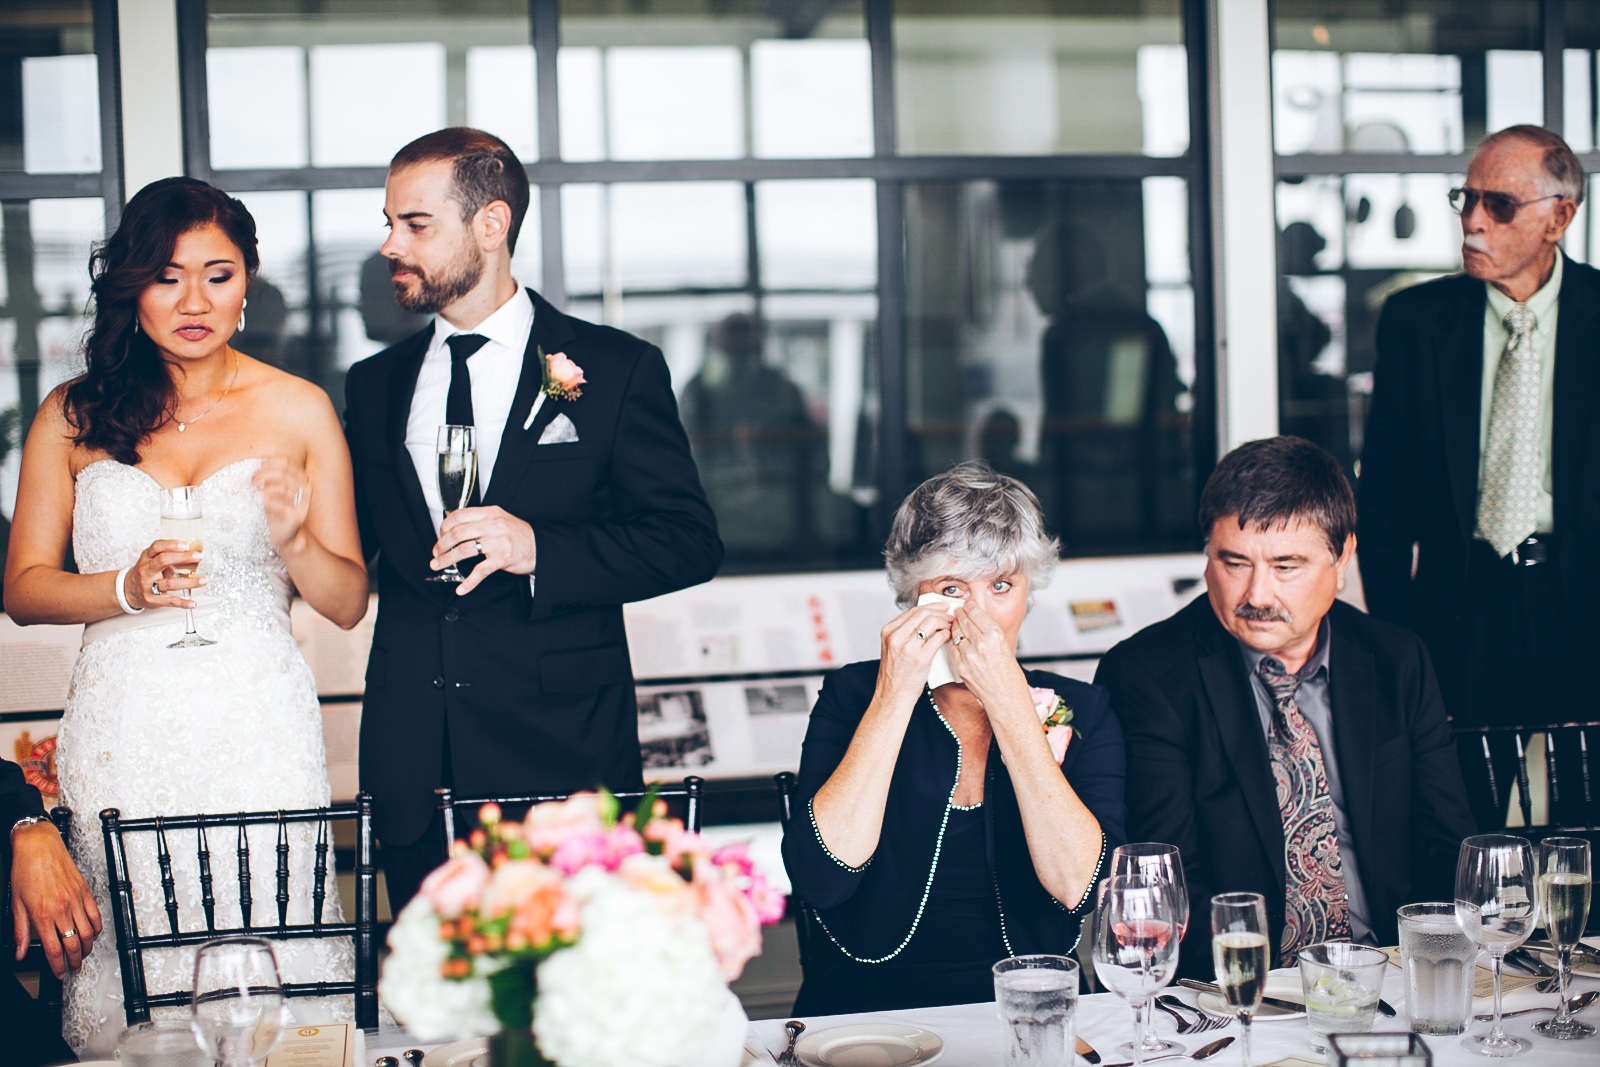 San_francisco_city_hall_wedding_photography_meegan_travis_ebony_siovhan_bokeh_photography_77.jpg